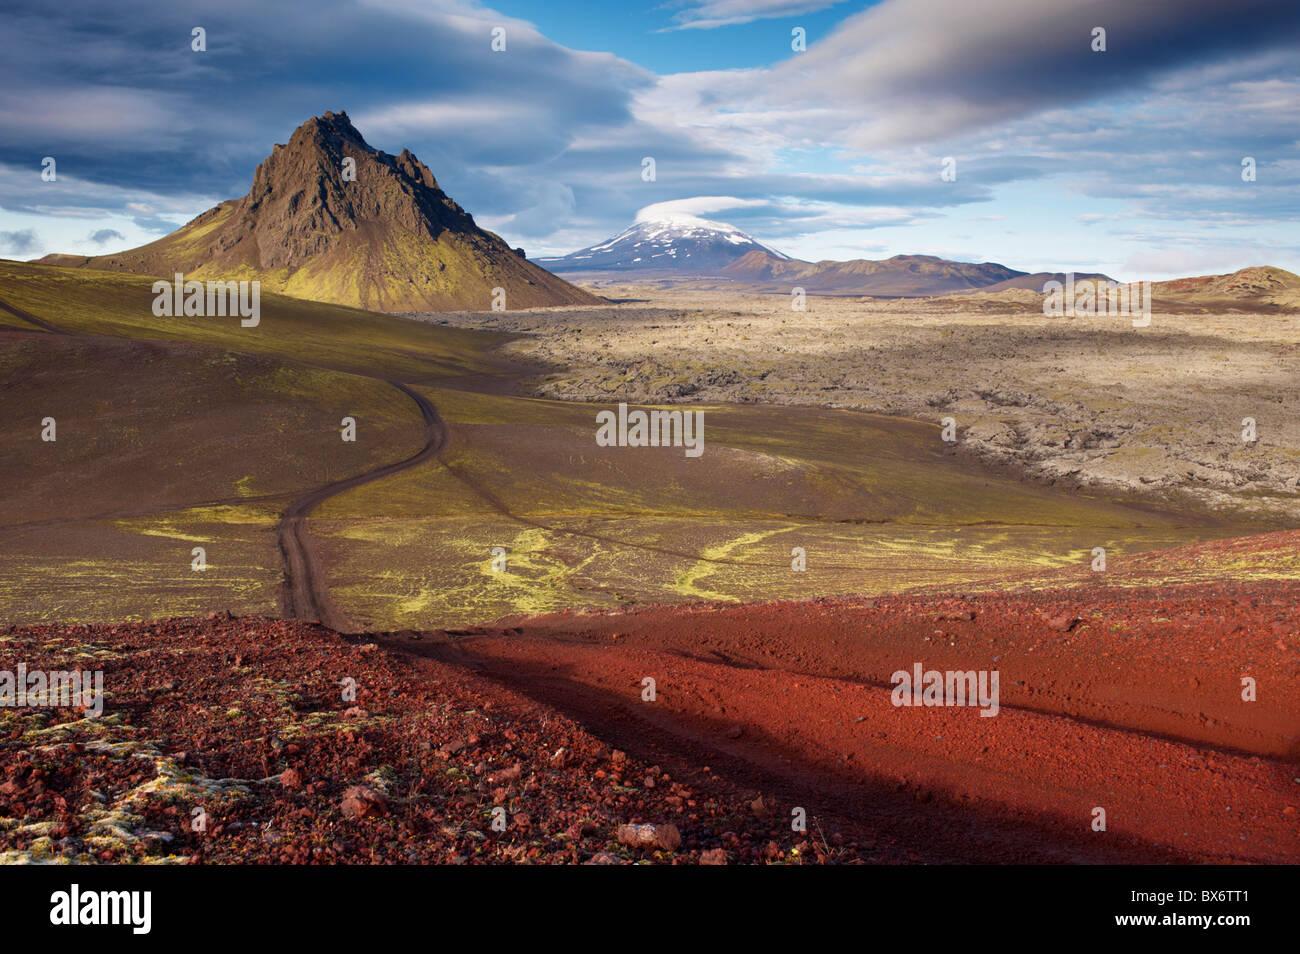 Mount Krakatindur, 858 m, standing solitary in the Nyjahraun lava field, Fjallabak, Iceland Stock Photo